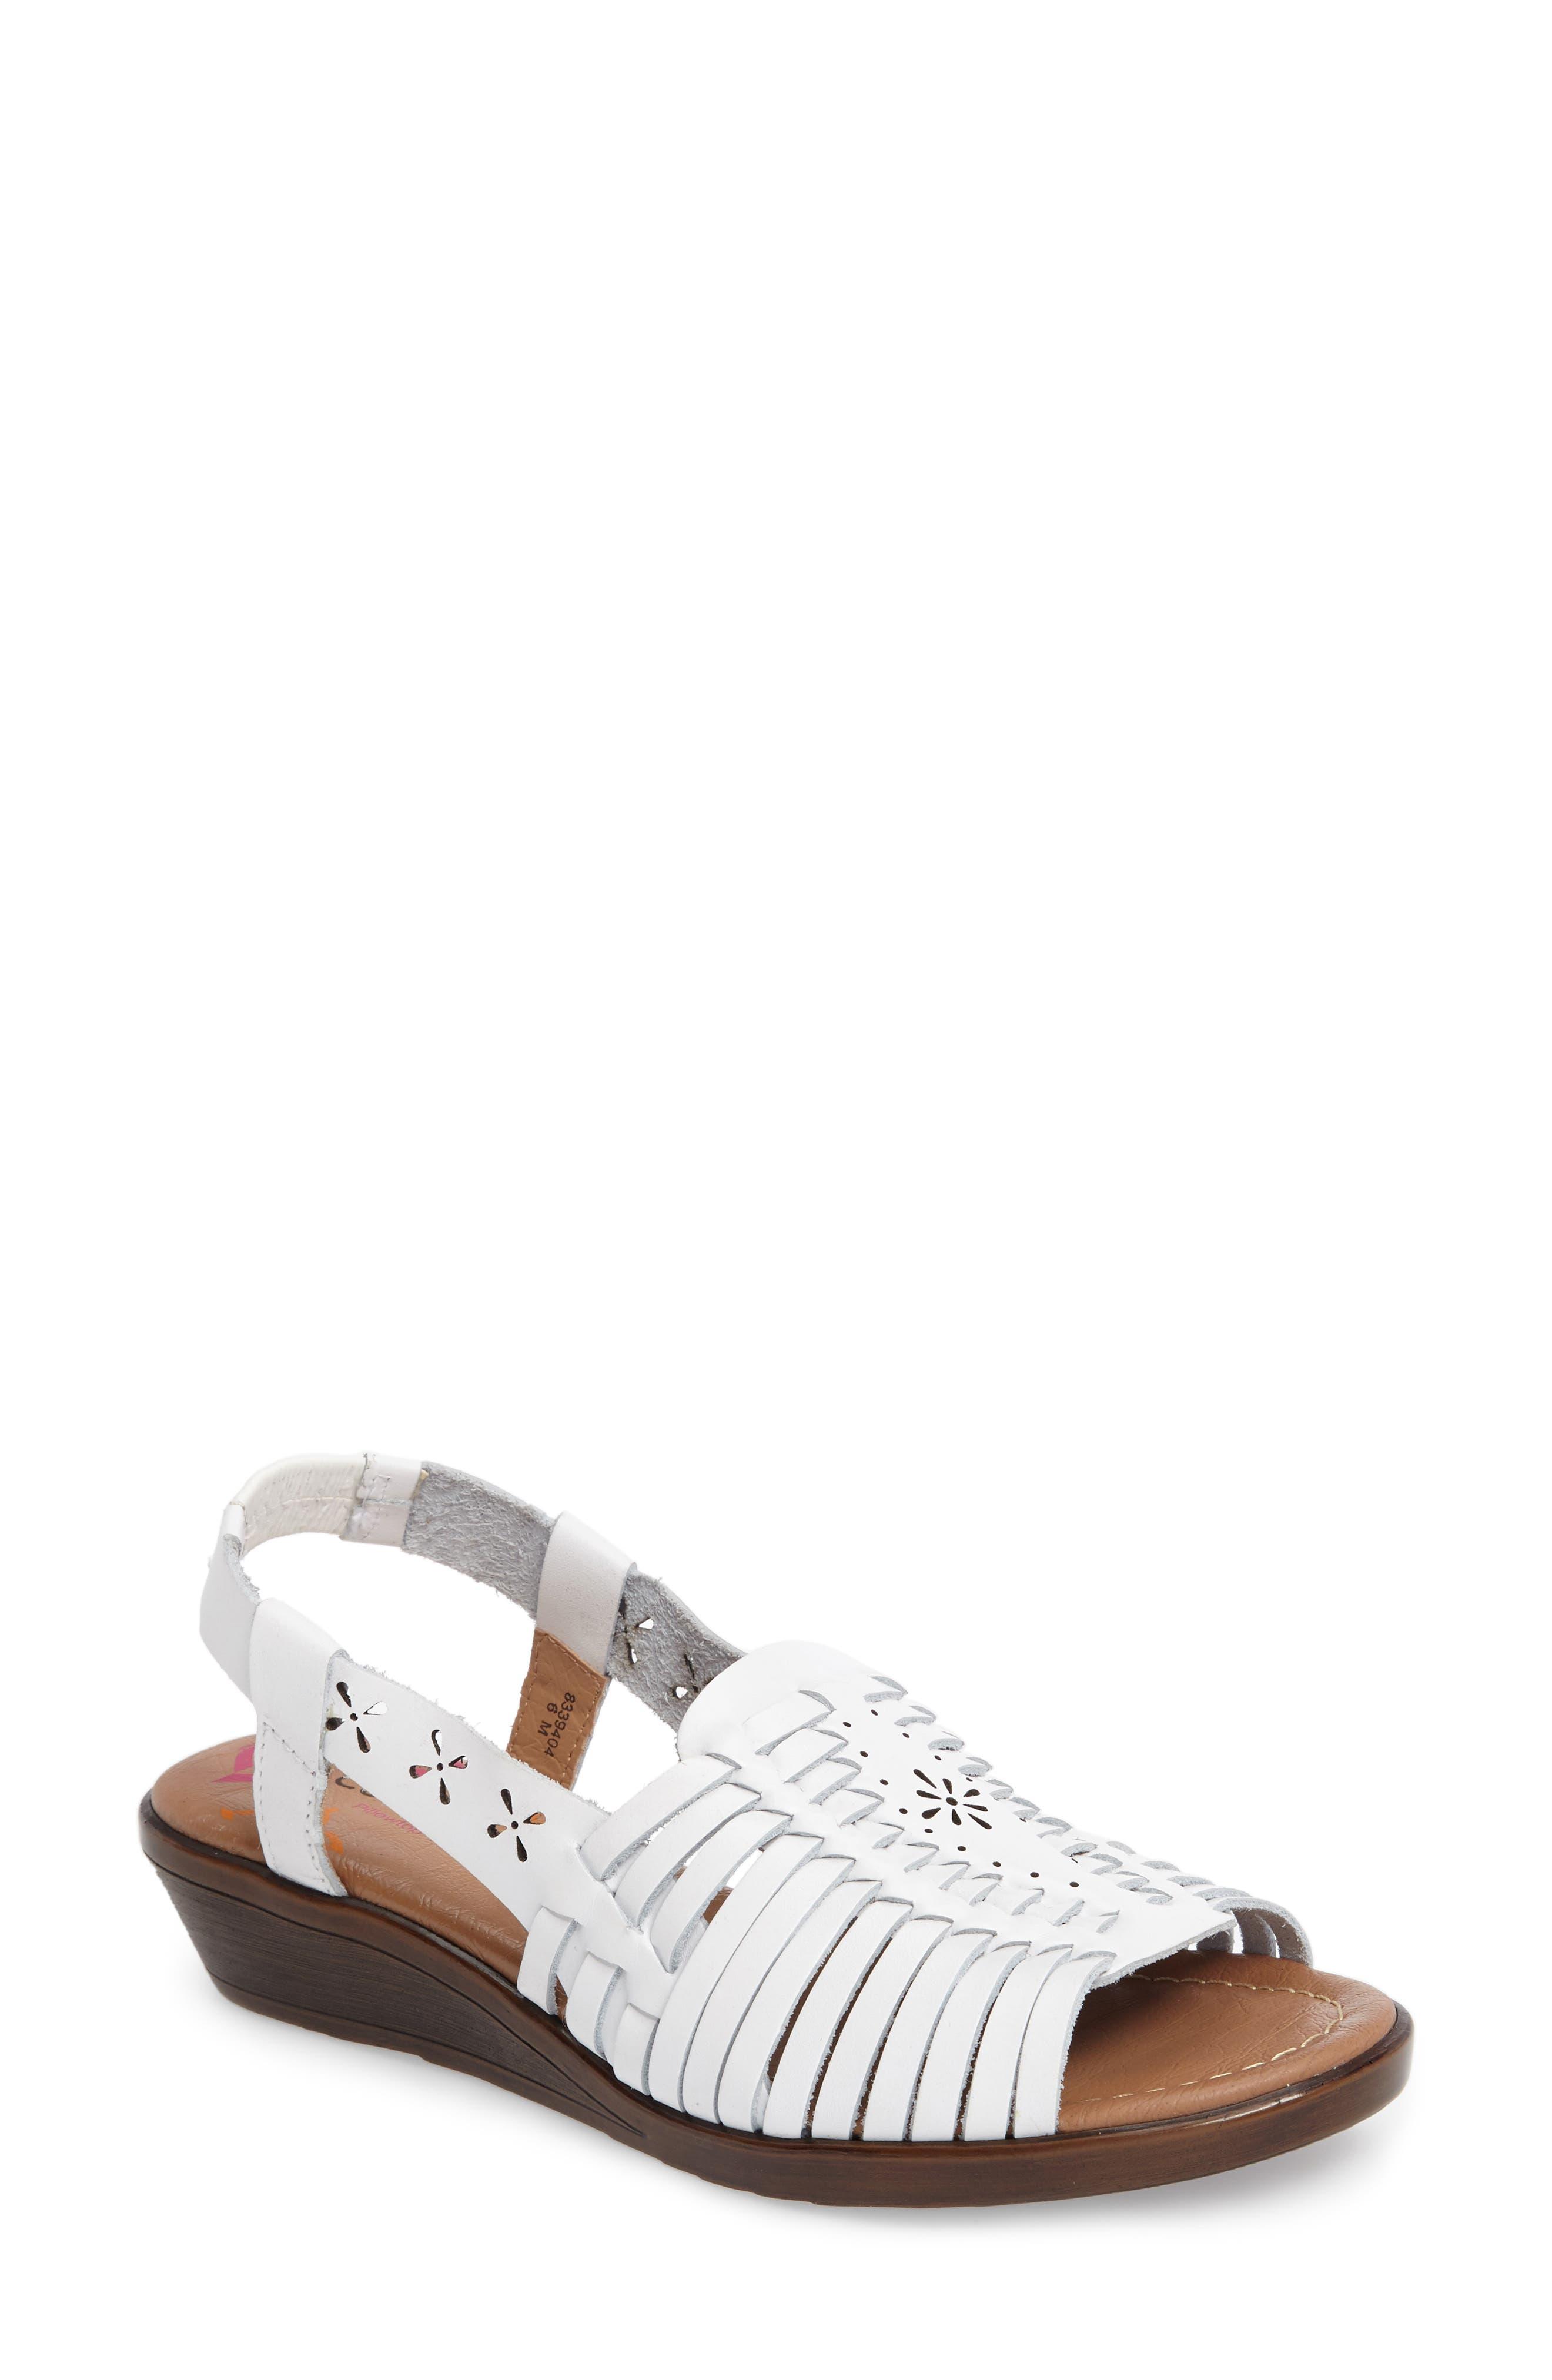 Alternate Image 1 Selected - Comfortiva Formasa Huarache Slingback Sandal (Women)